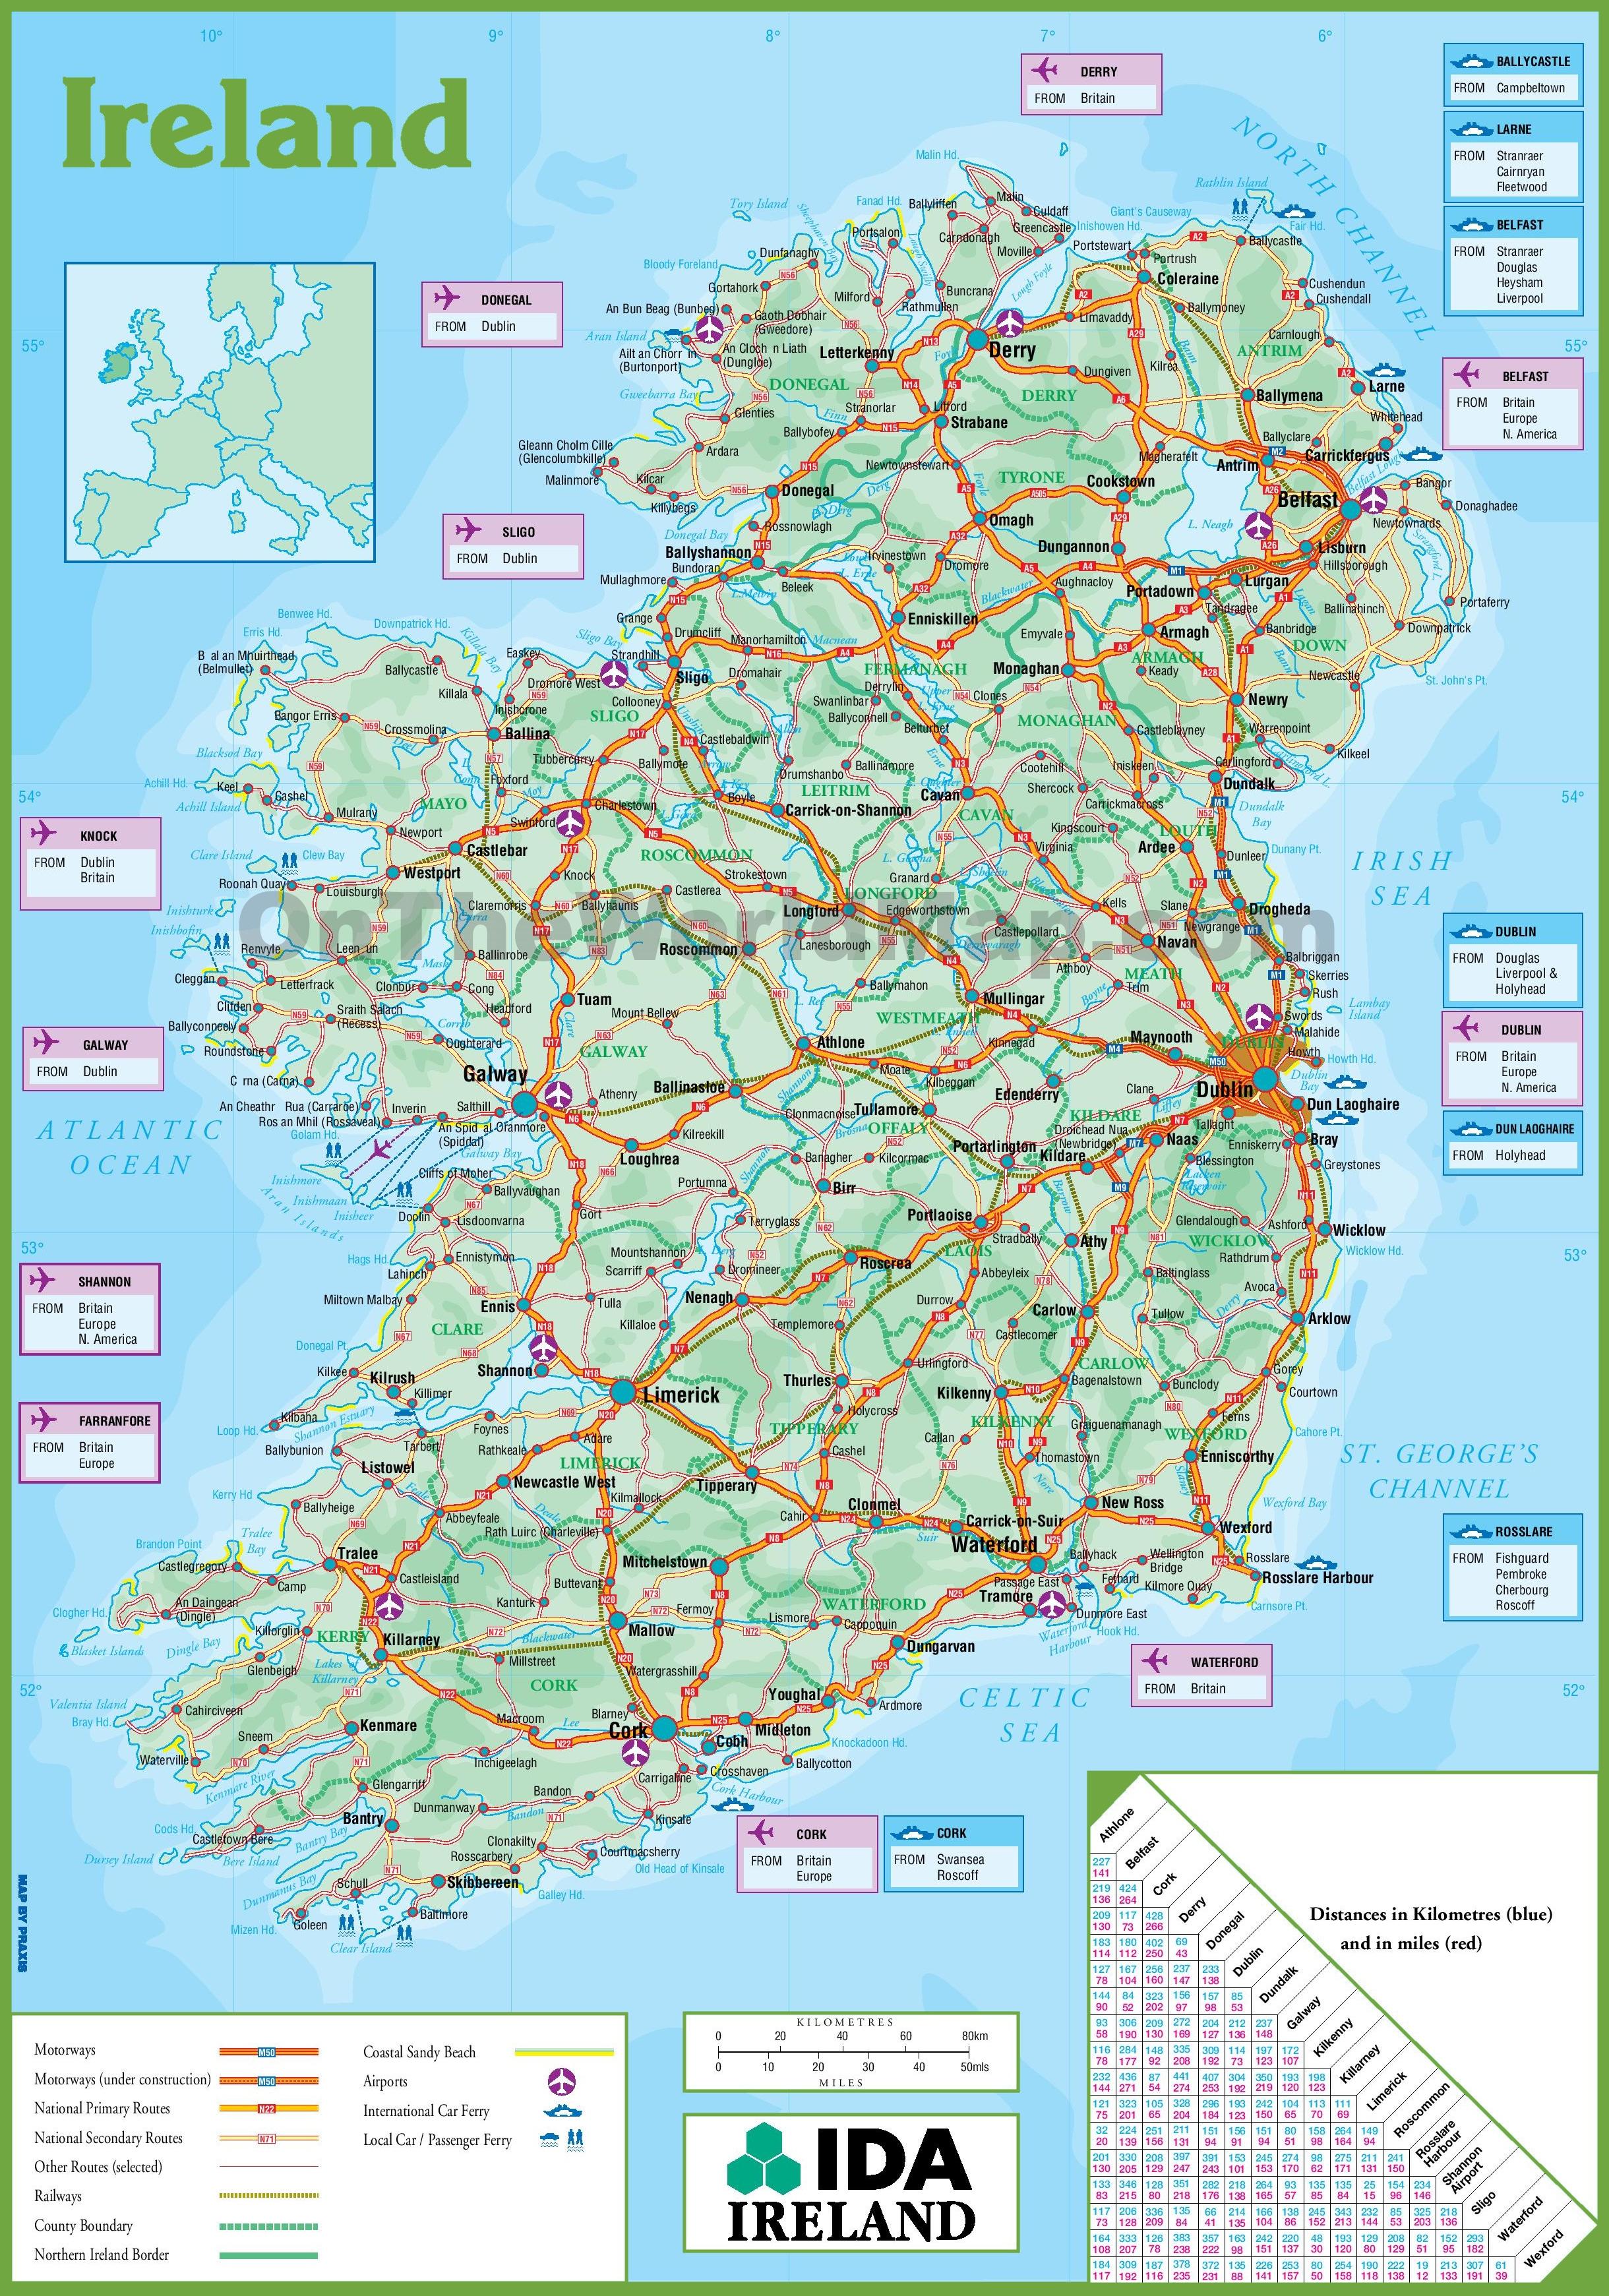 Ireland Road Map - Free Printable Driving Maps